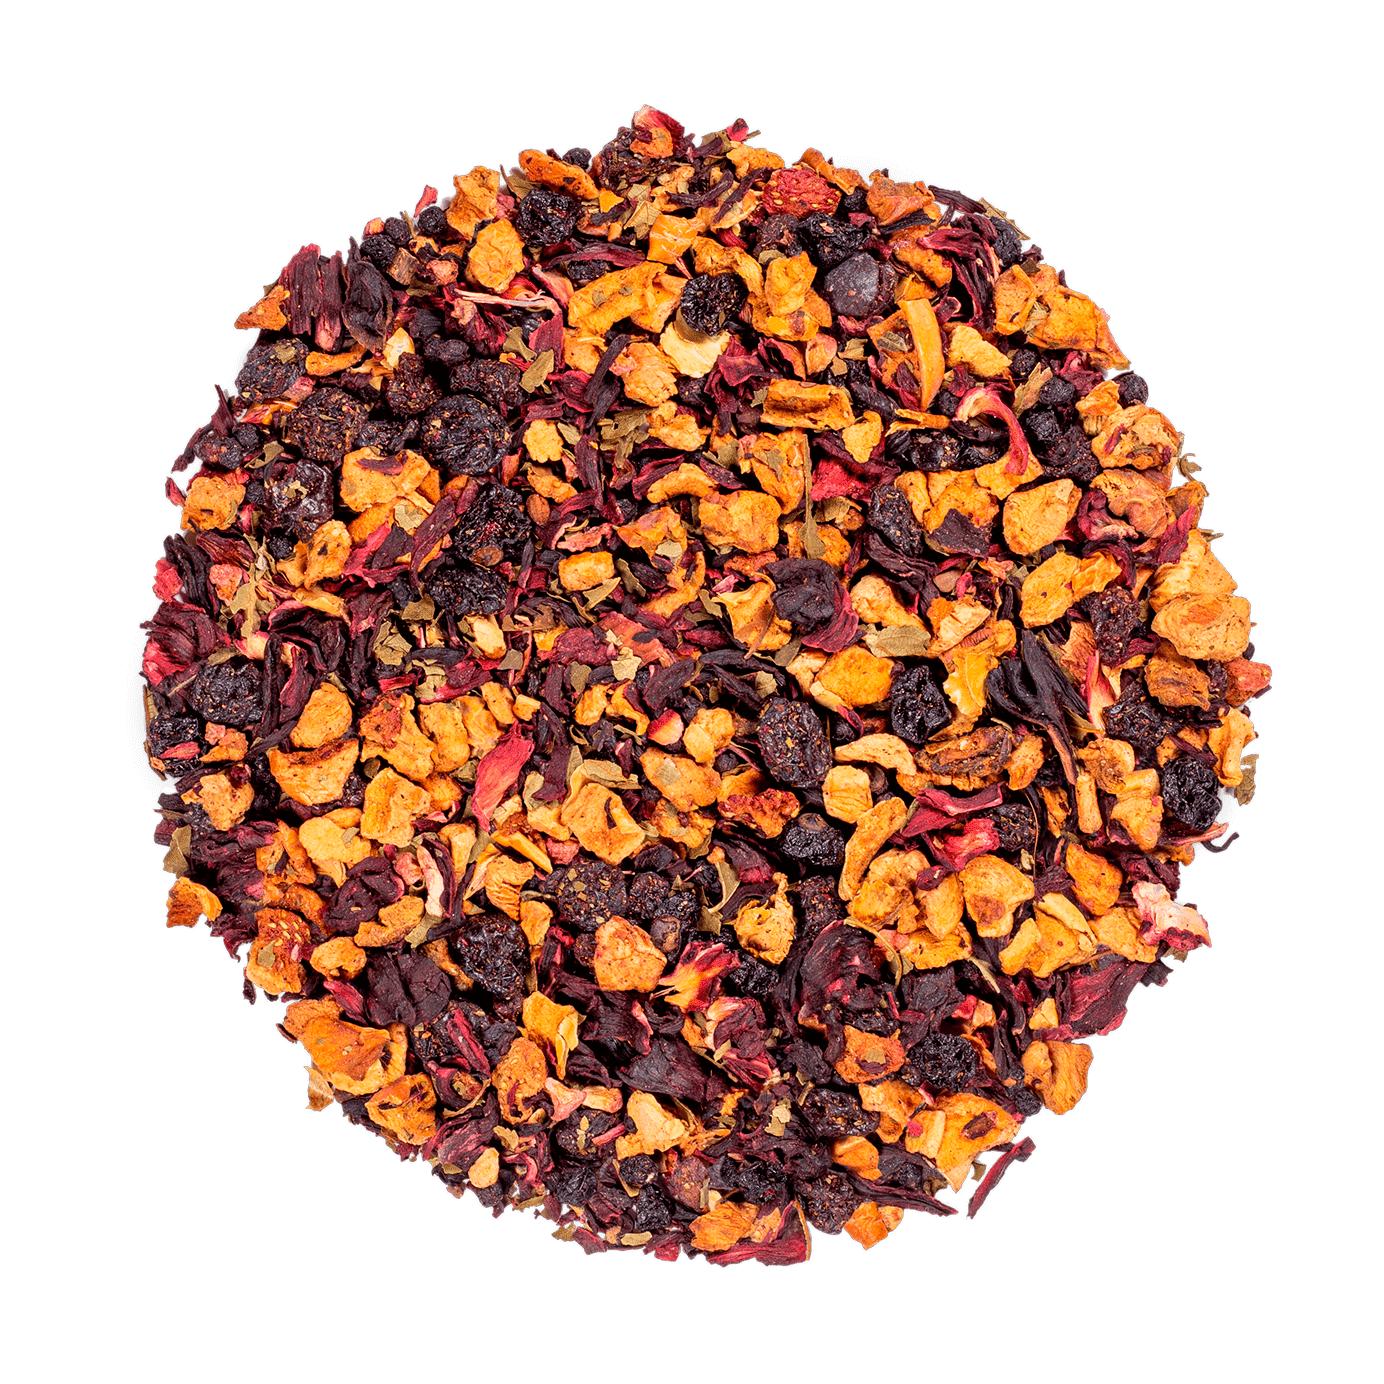 KUSMI TEA AquaRosa (Infusion de fruits bio) - Infusion hibiscus, fruits rouges - Thé en vrac - Kusmi Tea